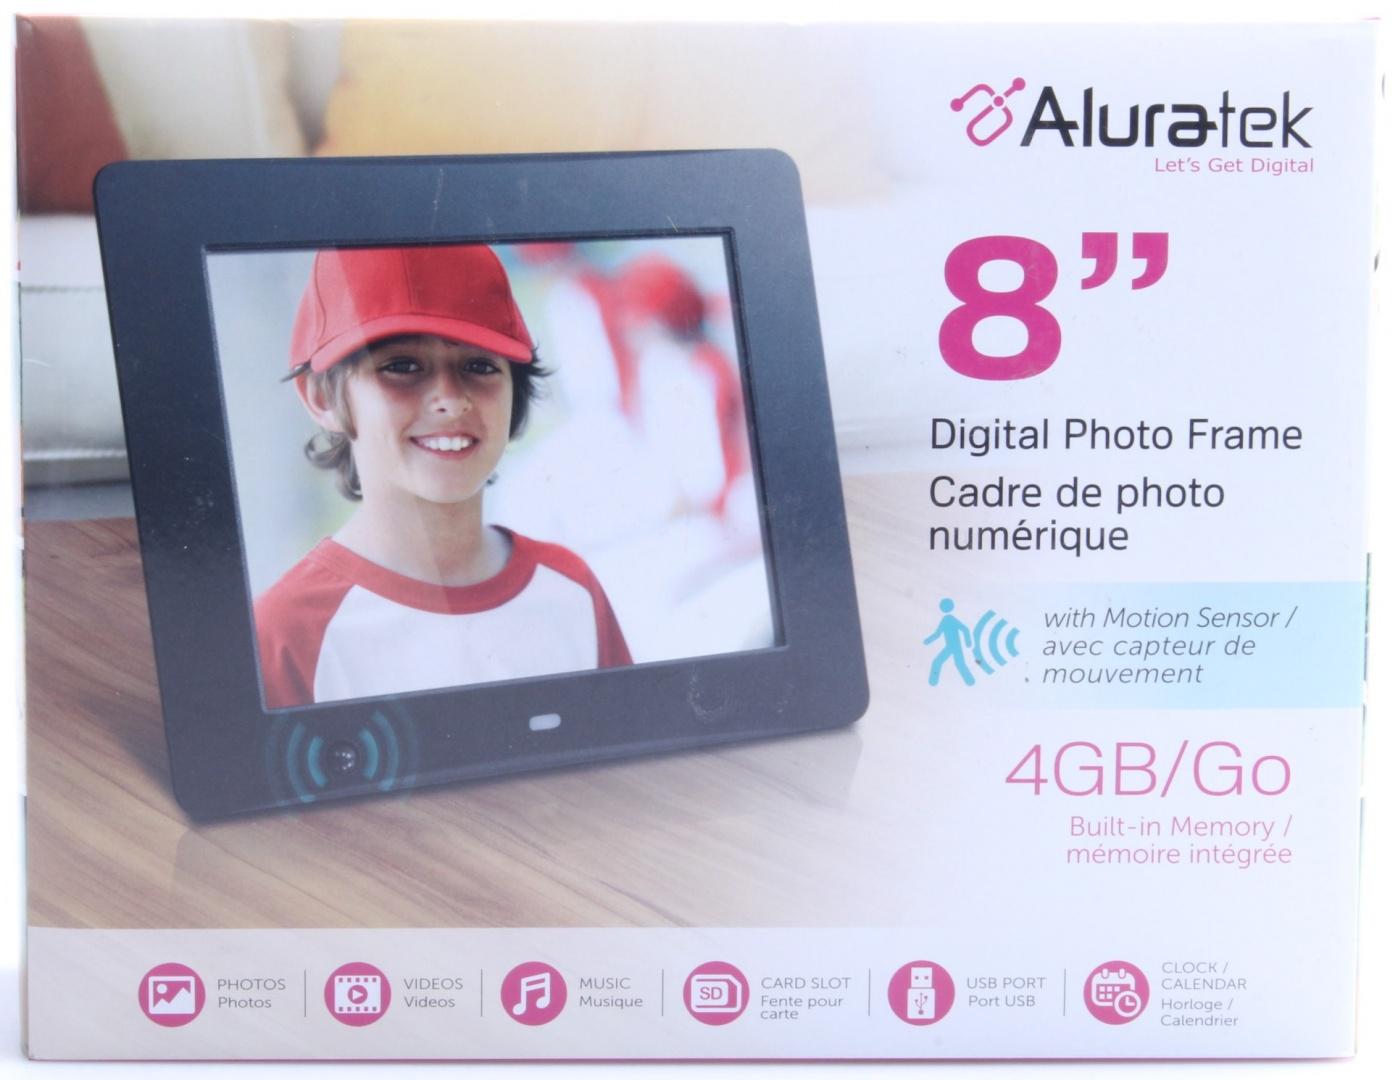 Digital Photo Frame Electronics: Buy Online from Fishpond.co.nz